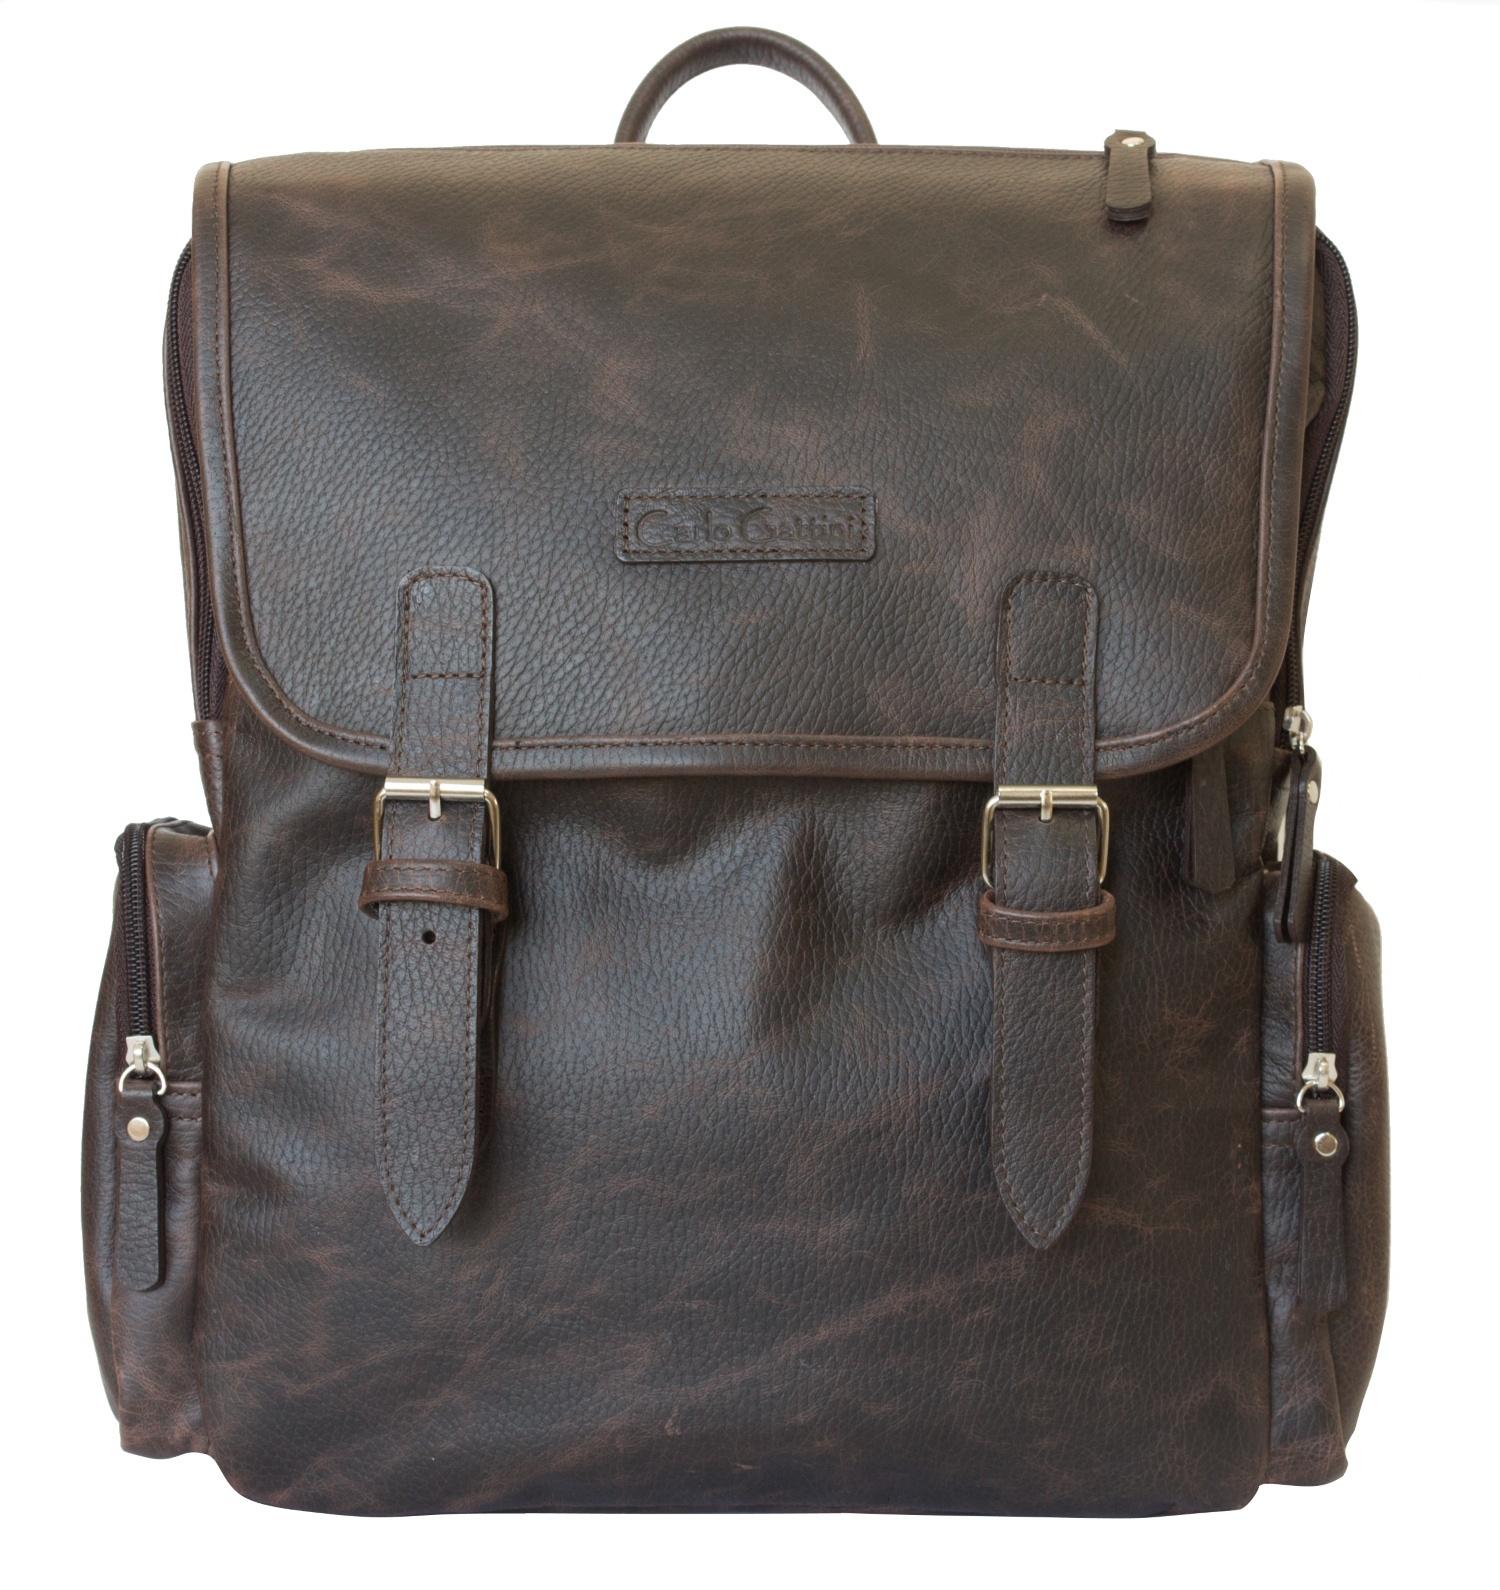 Рюкзак Carlo Gattini Santerno, темно-коричневый ноутбук 10 дюймов